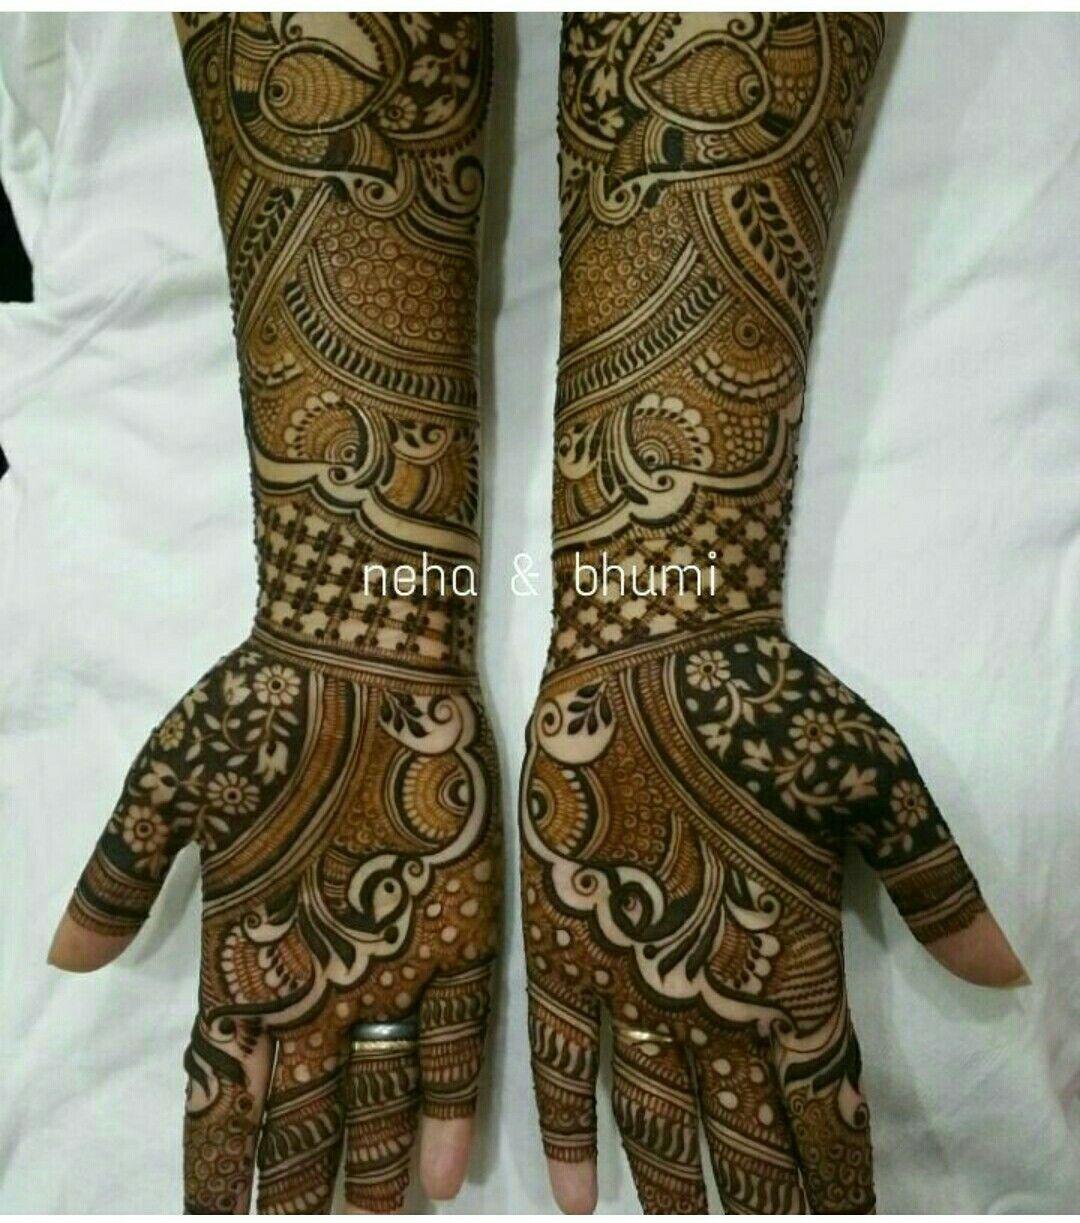 Images about mehndi design on pinterest mehndi - Henna Art Henna Mehndi Arabic Mehndi Bridal Henna Henna Designs Unique Mehndi Designs Bridal Mehndi Designs Henna Tattoos Mehndi Tattoo